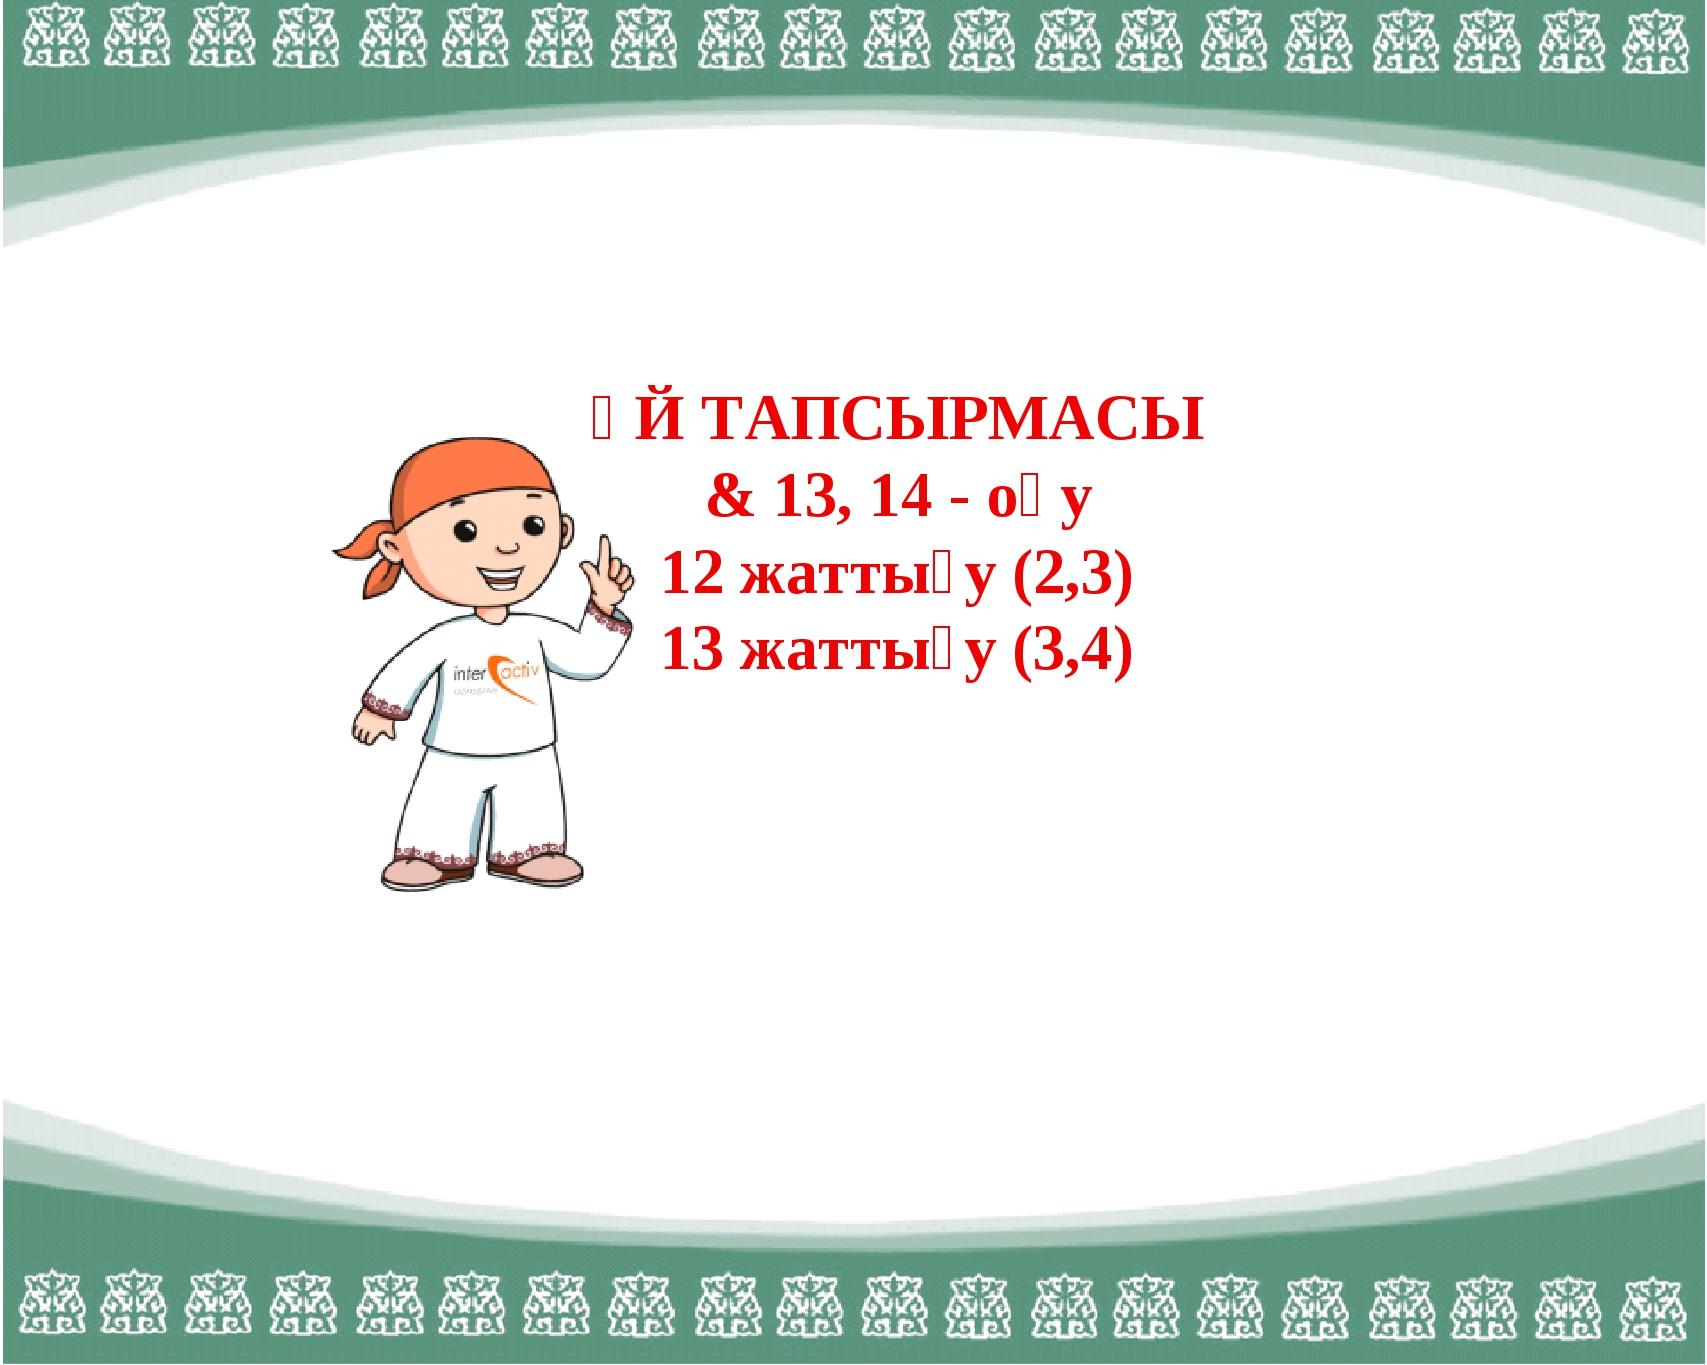 ҮЙ ТАПСЫРМАСЫ & 13, 14 - оқу 12 жаттығу (2,3) 13 жаттығу (3,4)